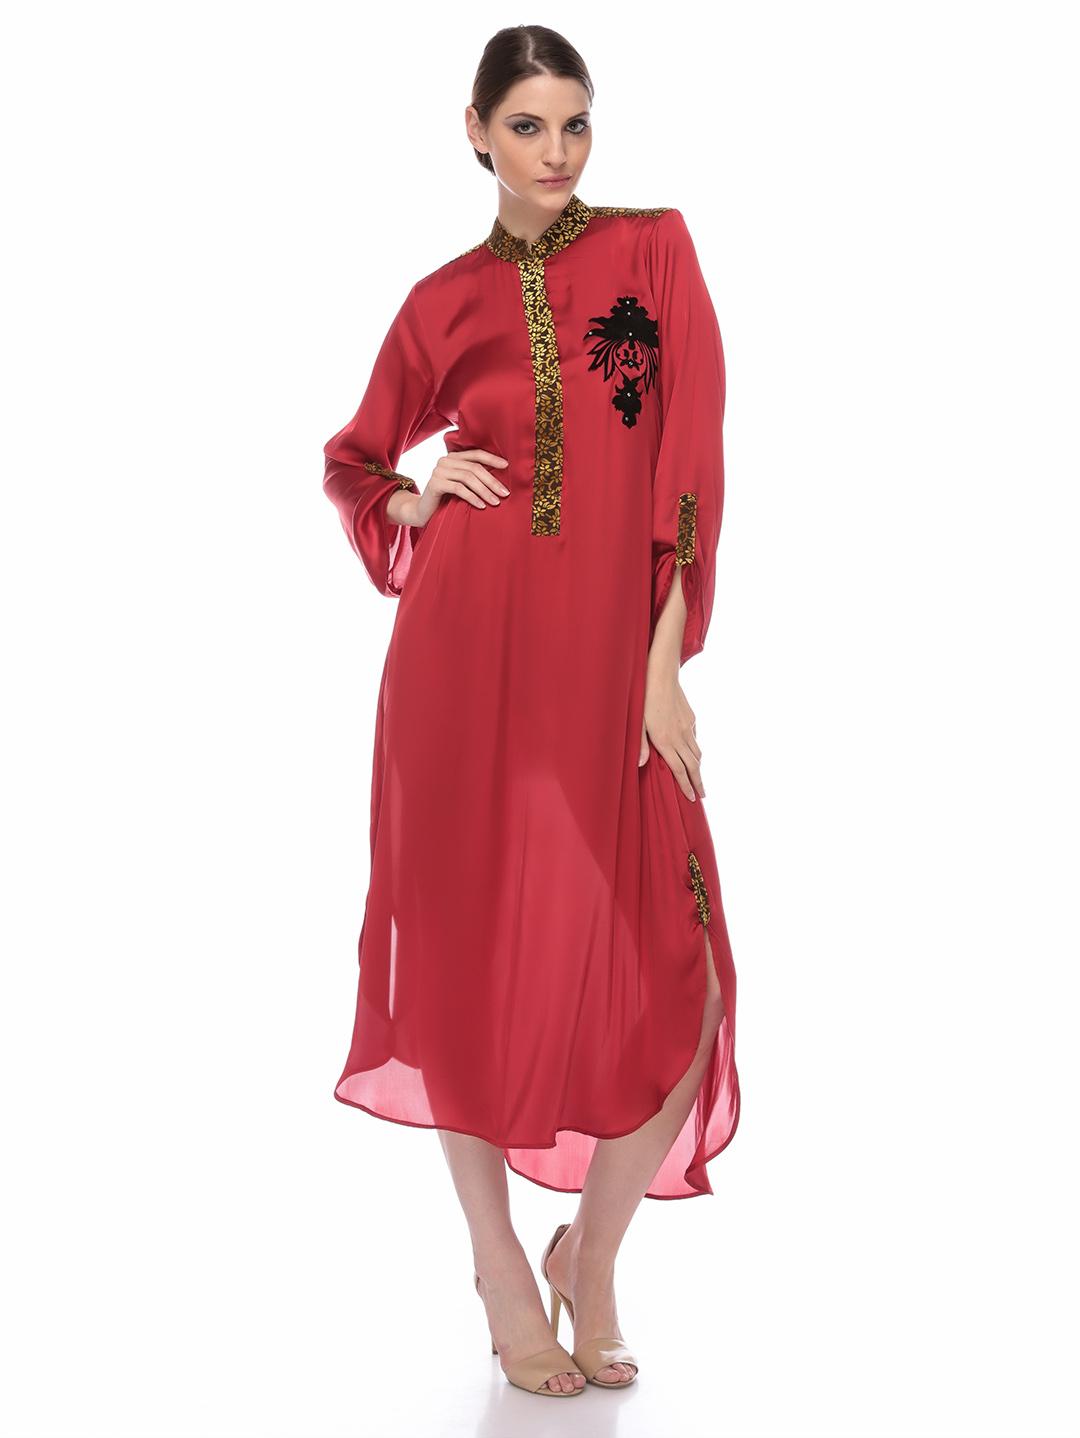 silk long shirtskurta designs 2013 for girls